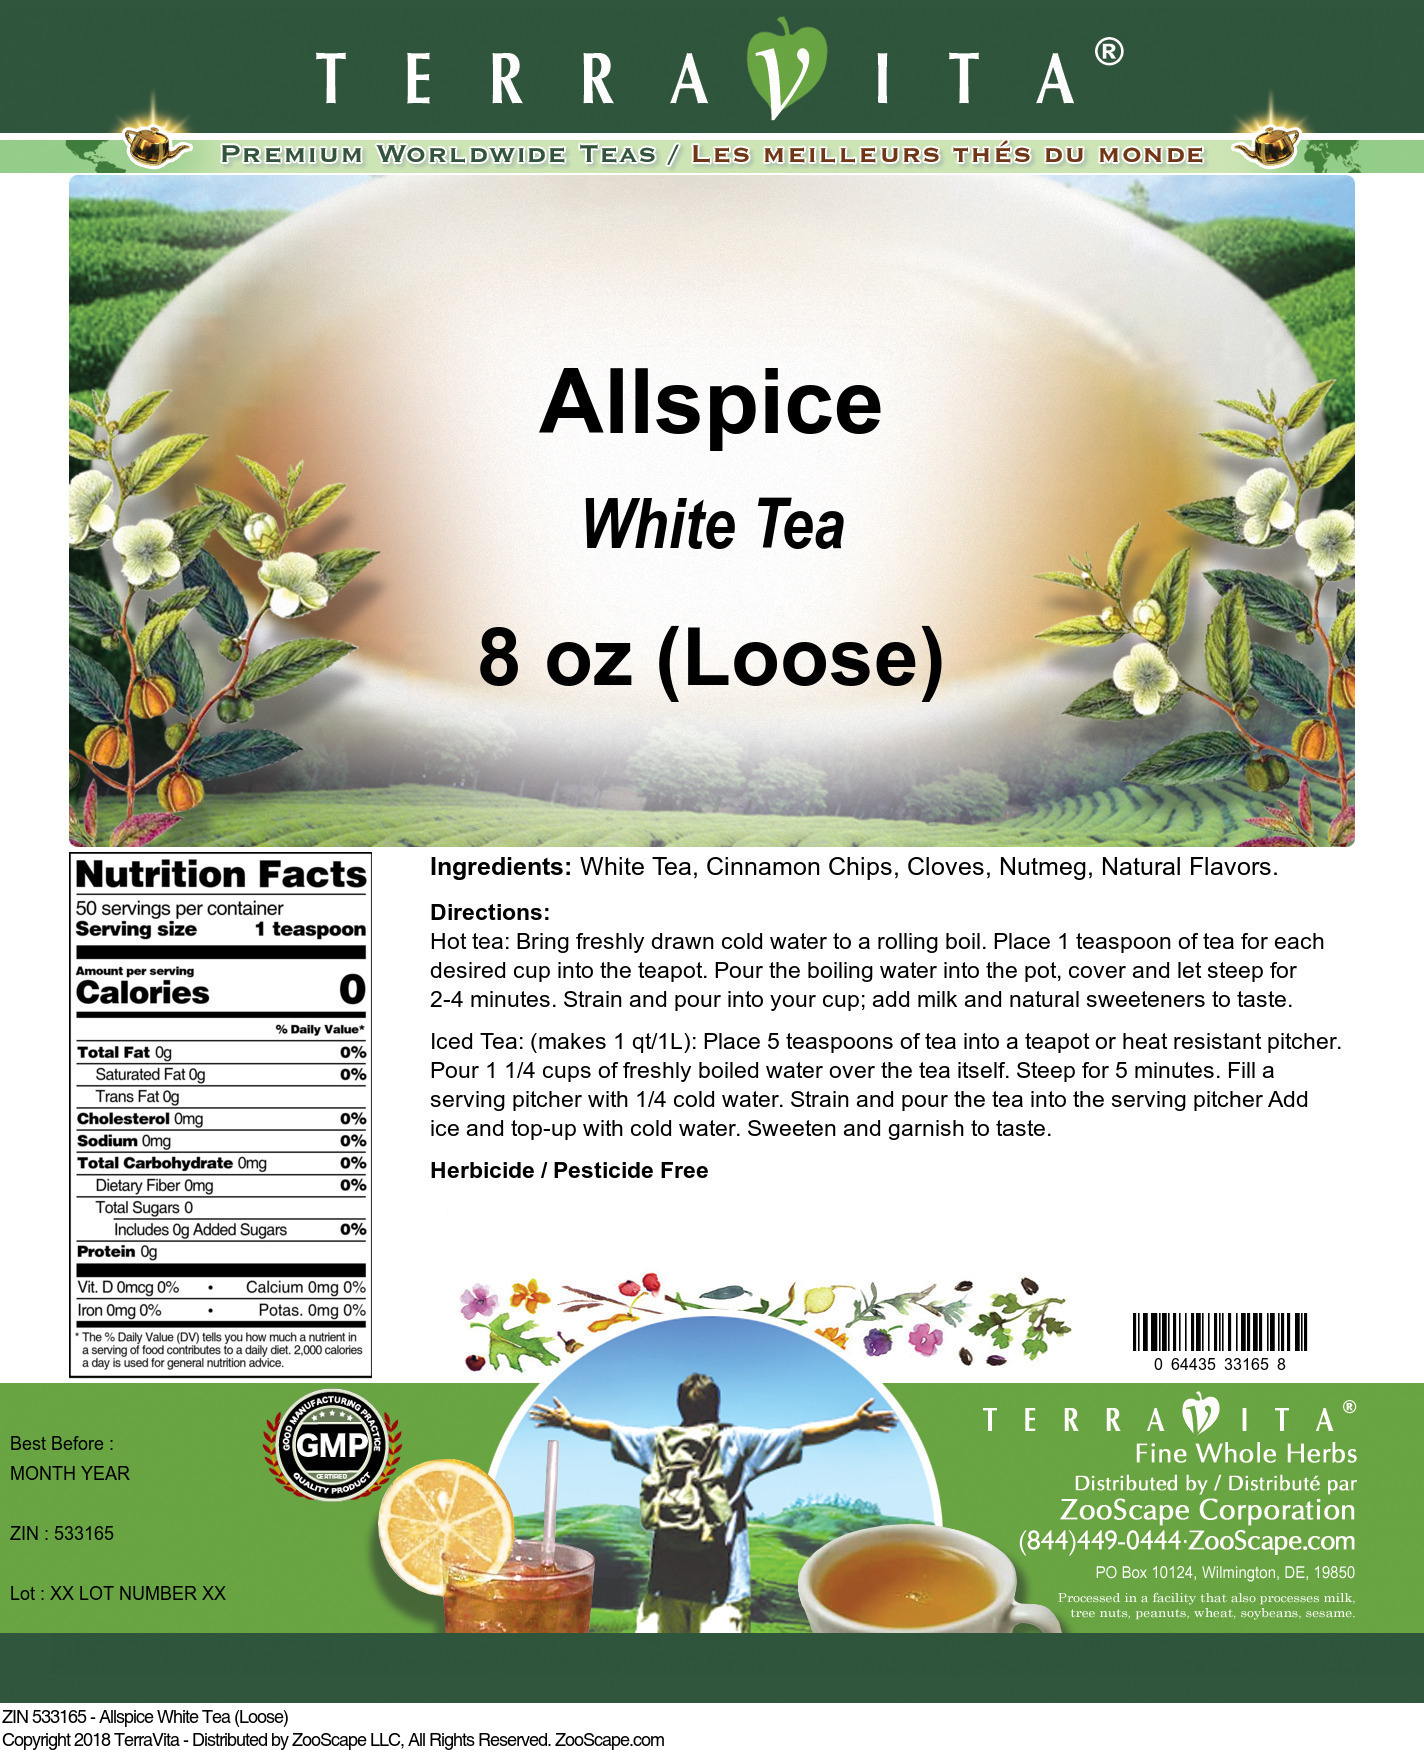 Allspice White Tea